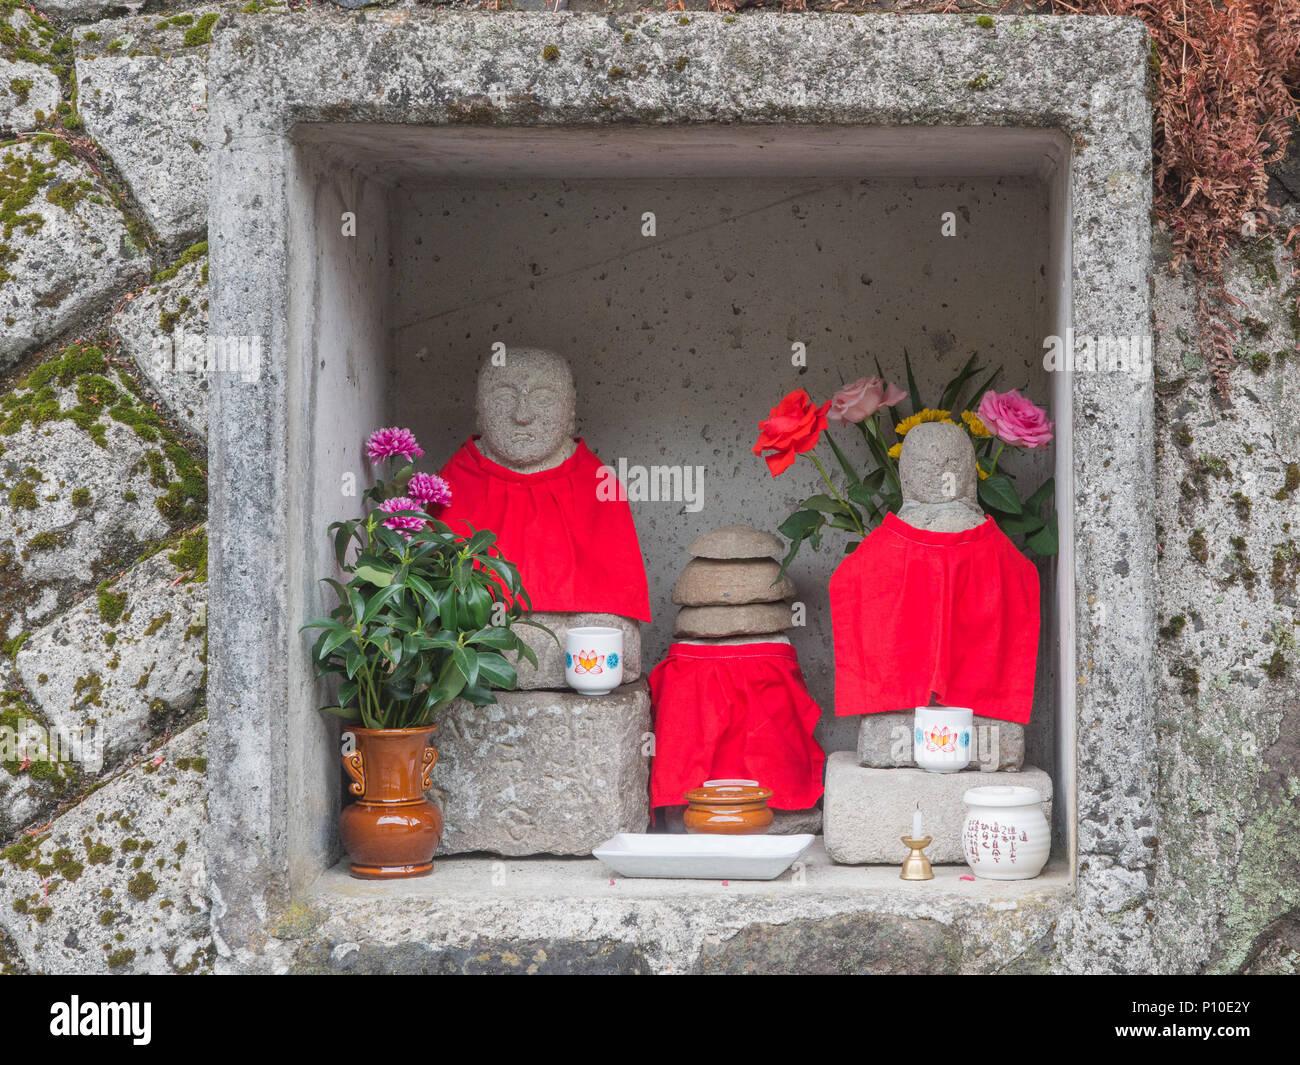 Japanese religion. A roadside shrine,  with buddhist deities wering red bibs, Ehime, Shikoku, Japan - Stock Image